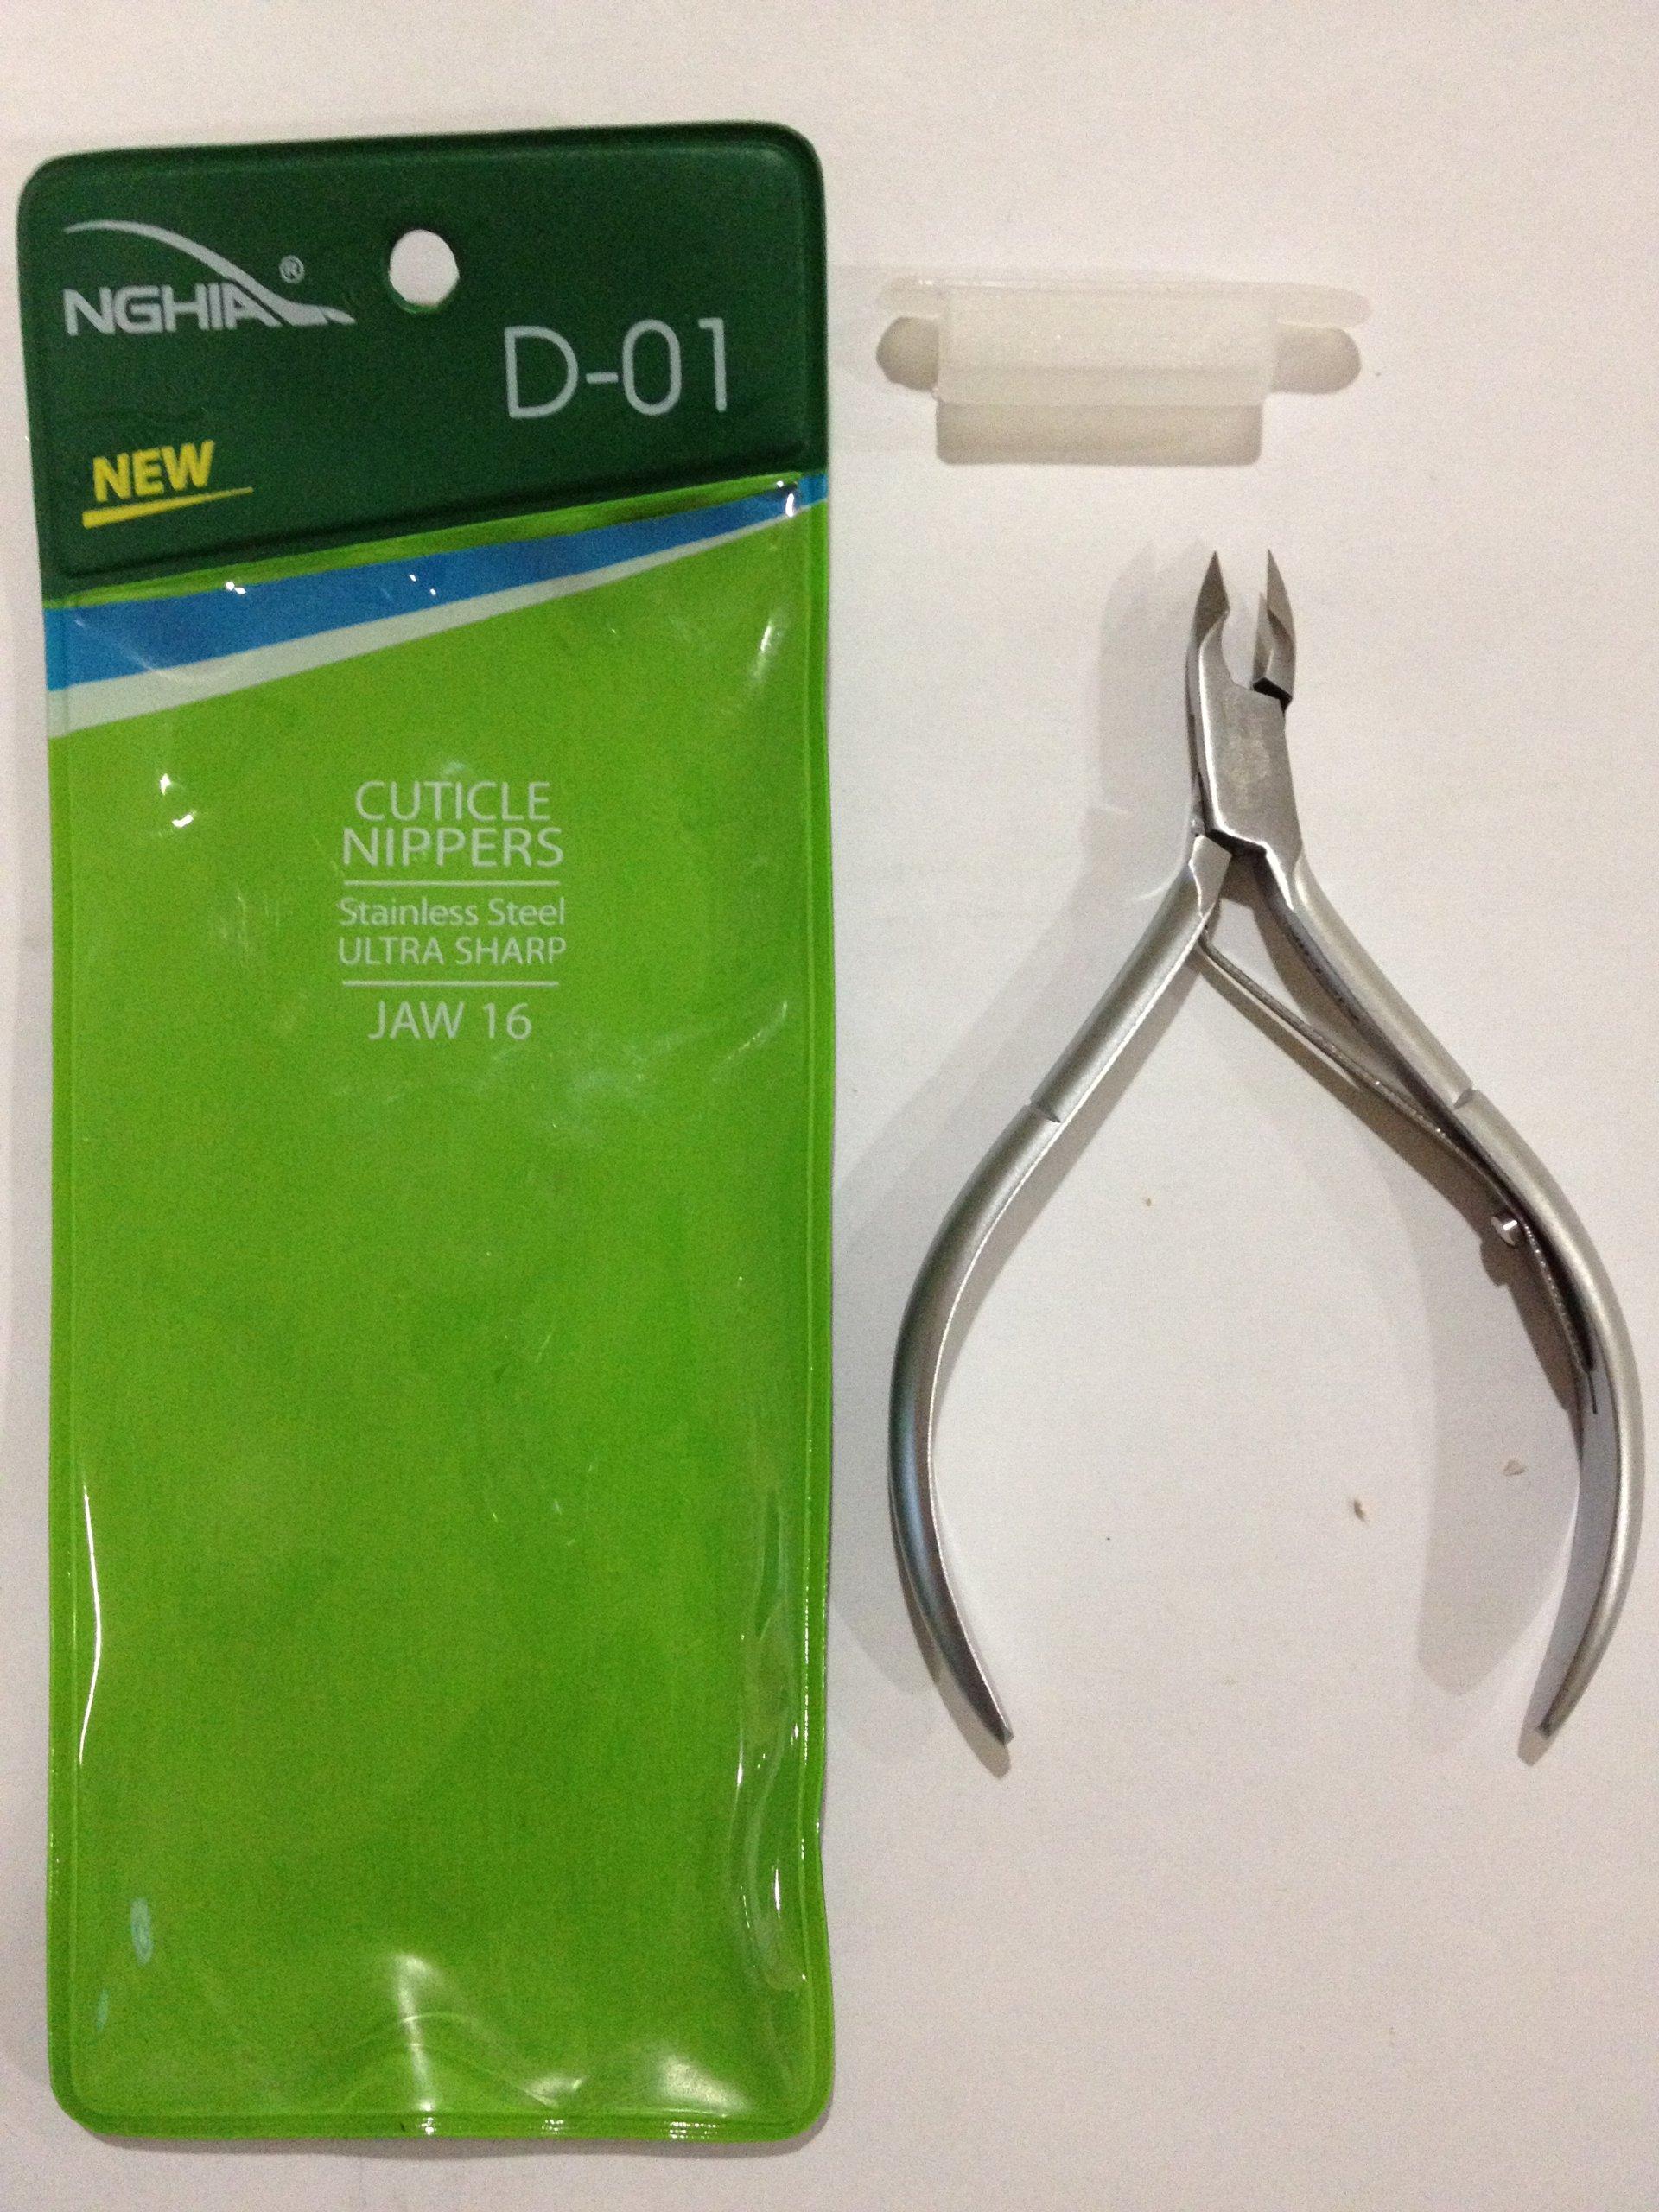 Nghia cuticle nippers D-01 jaw16 (D01 16)